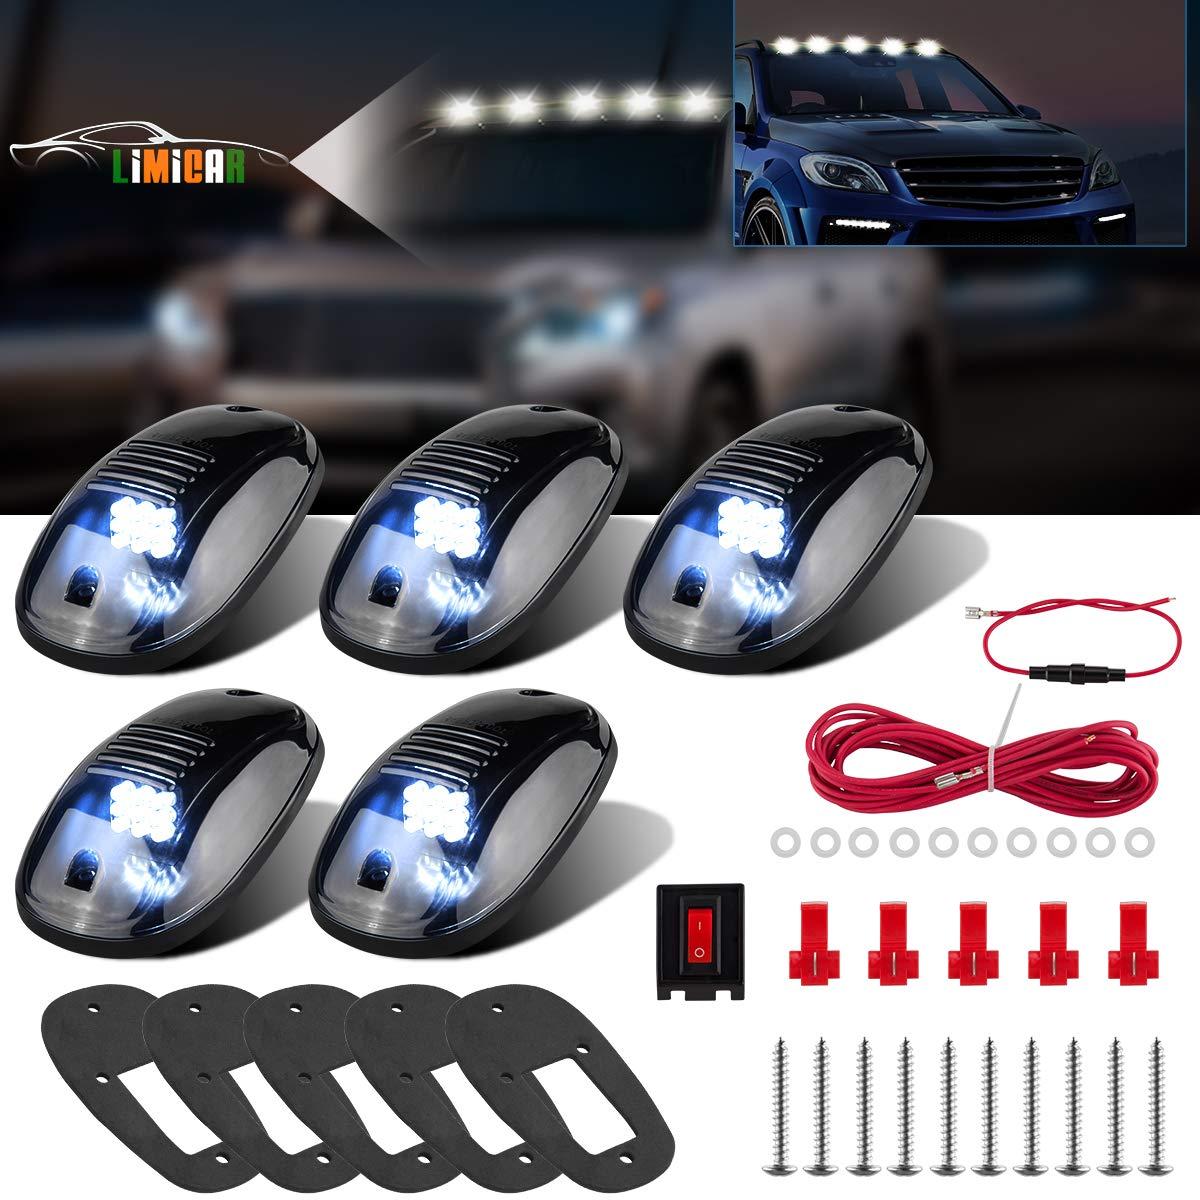 LIMICAR 5PCS Smoke Roof Cab Marker Running Light Covers Top Light White 9 LED Lamp Compatible w/ 03-10 Dodge Ram 1500 2500 3500 4500 5500 2011-2018 Ram 1500 2500 3500 4500 5500 Pickup Trucks